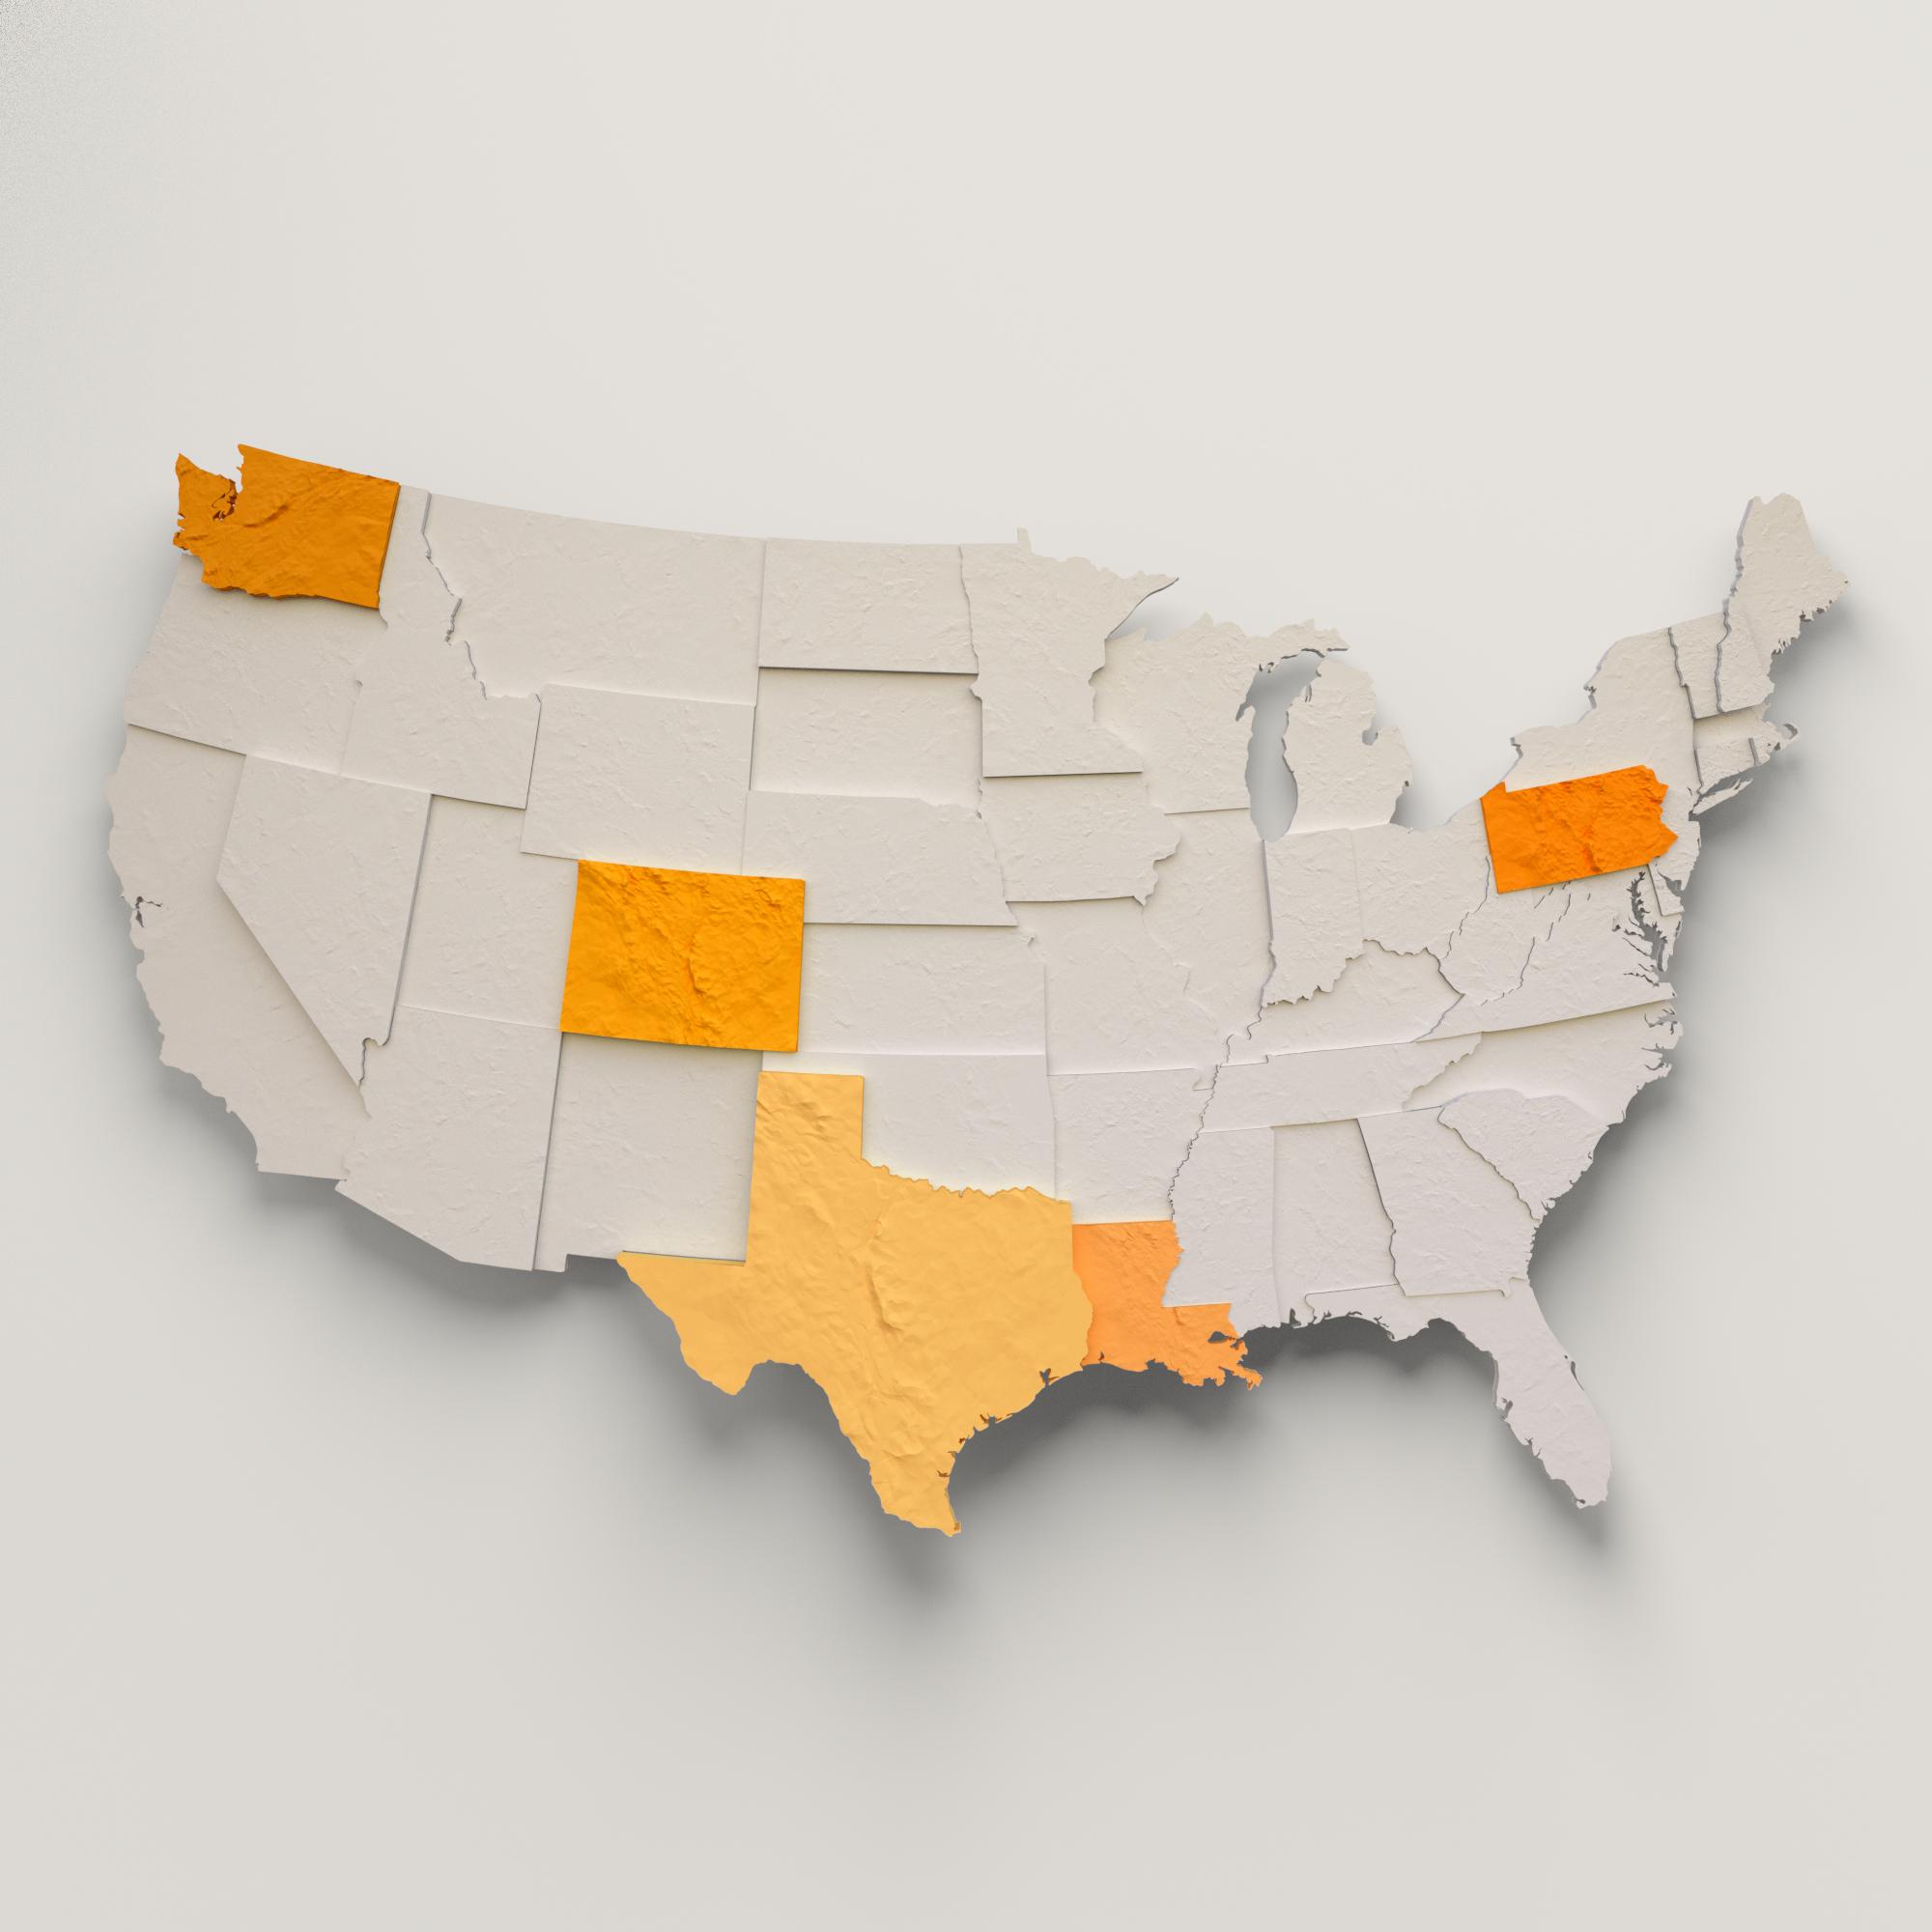 ACLU_Map_005d.jpg